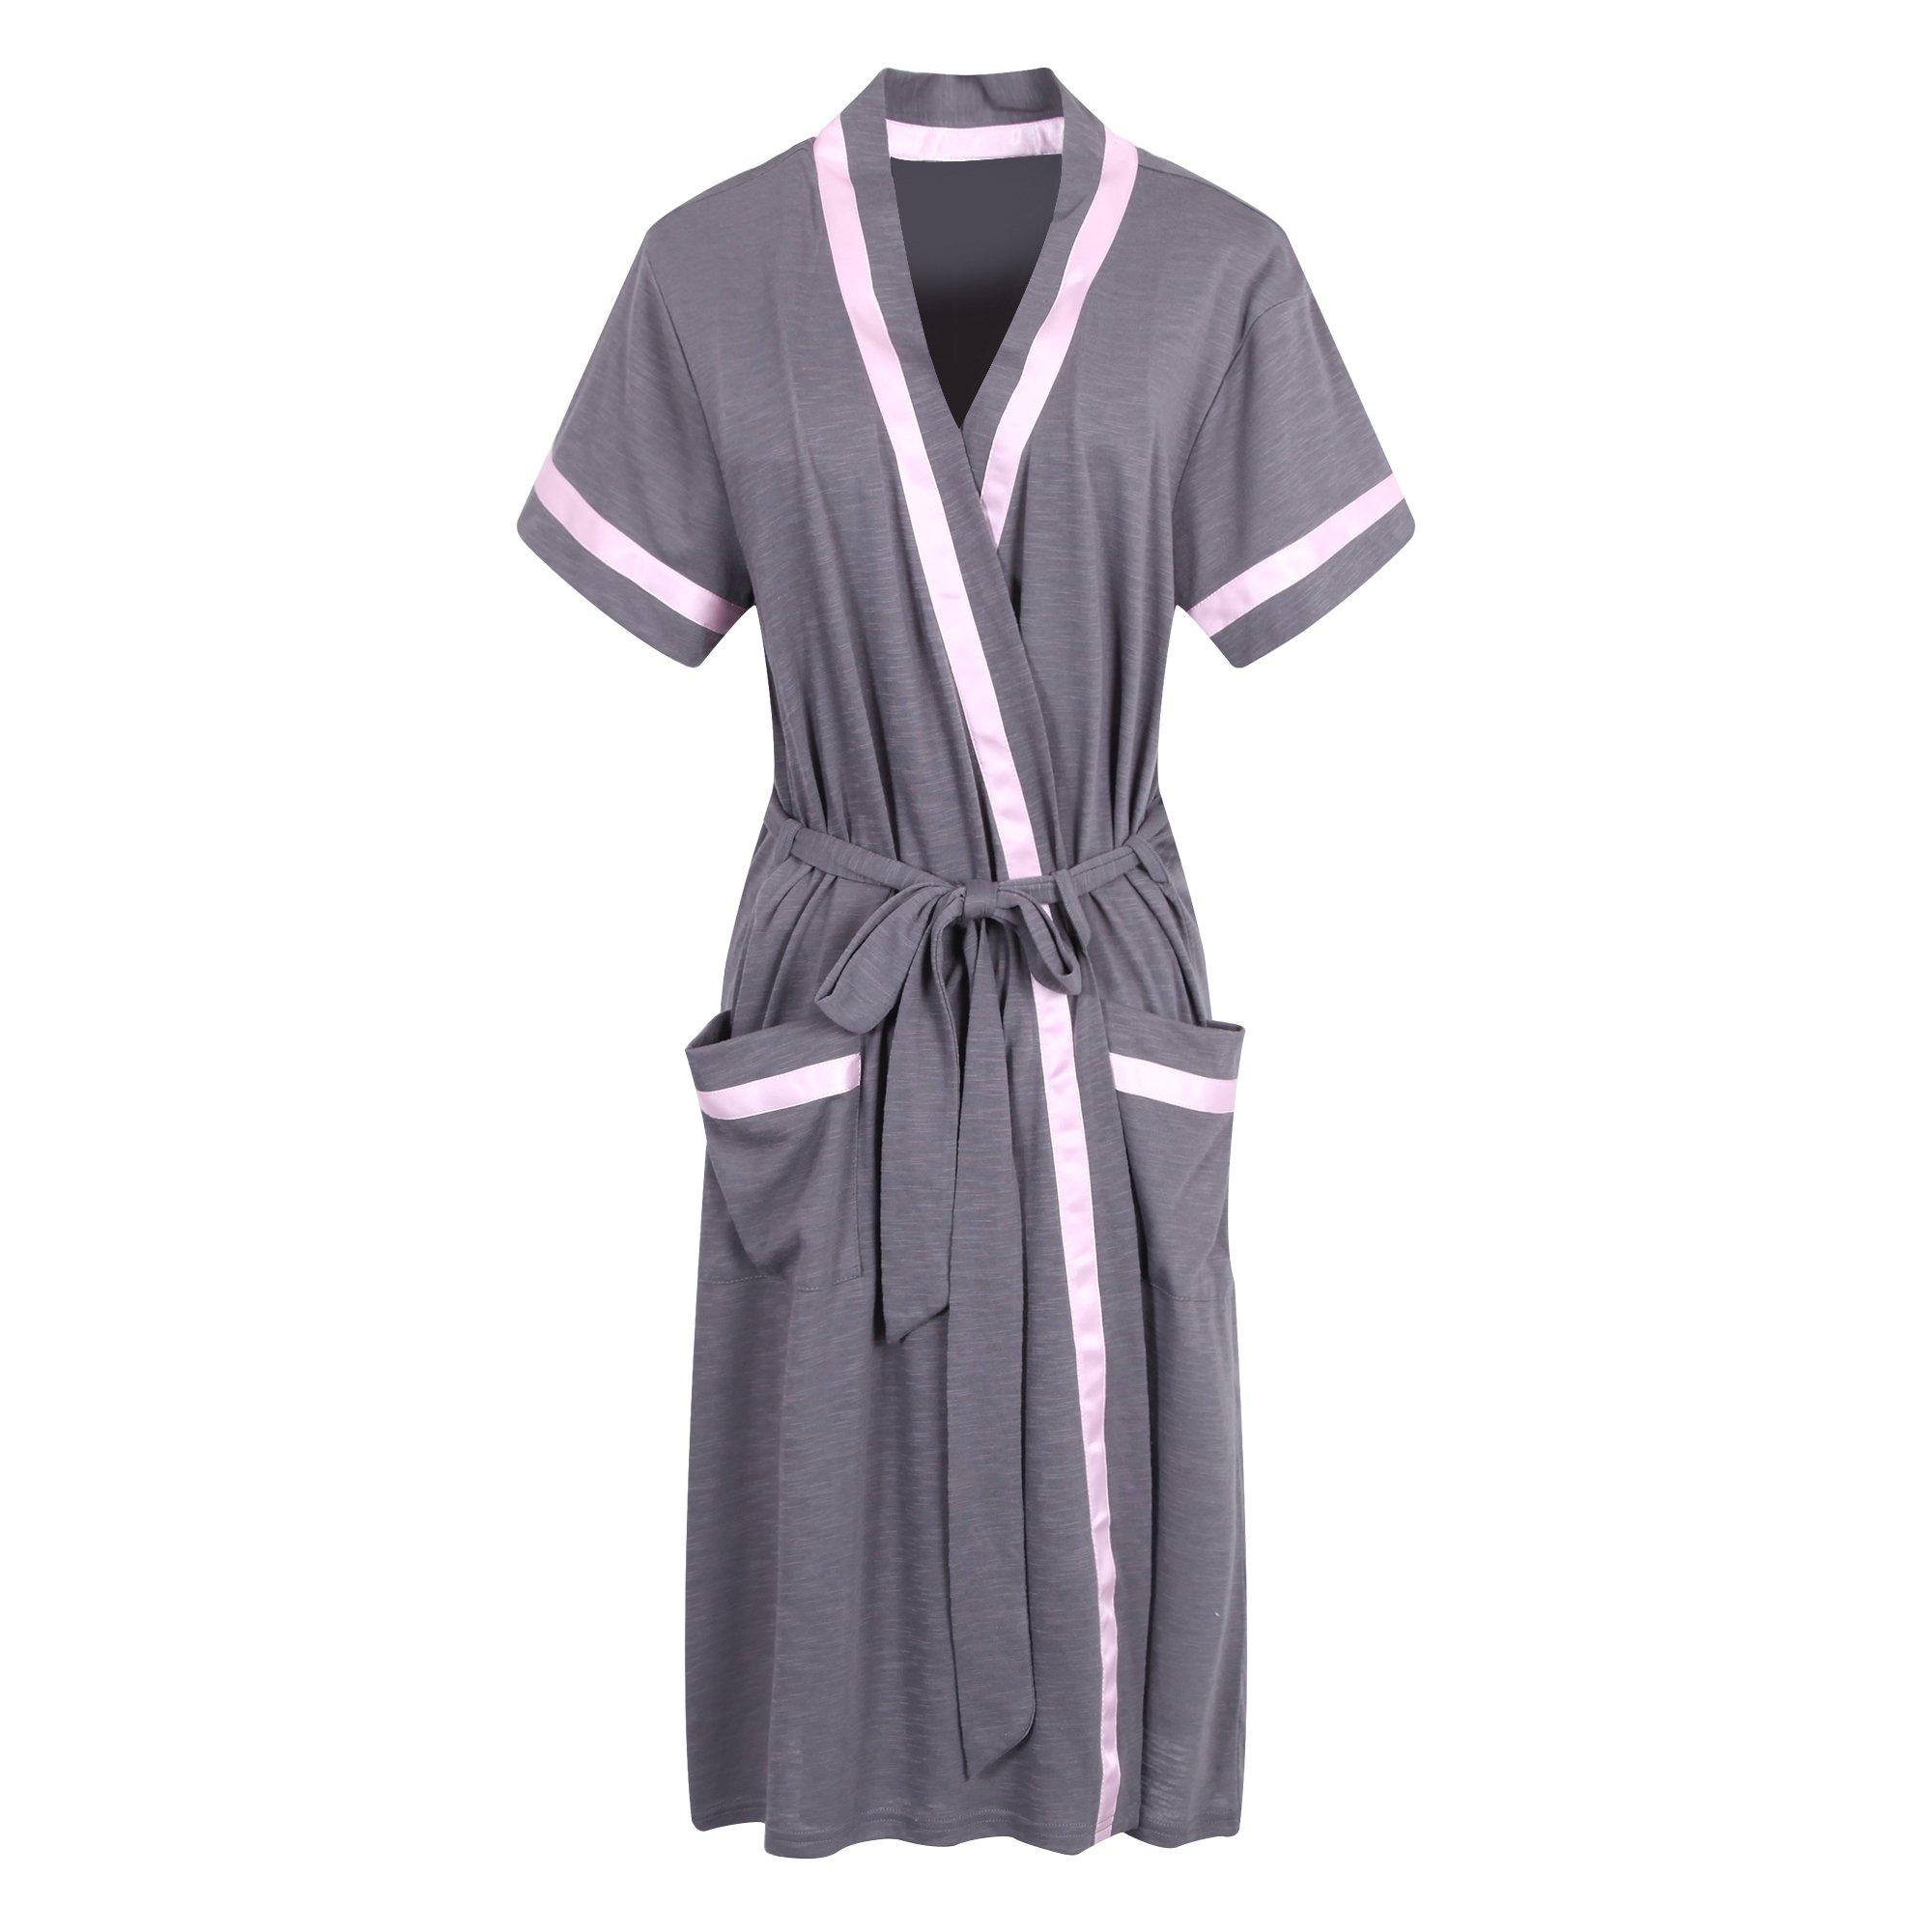 Richie House Women's Short Sleeve Cotton Bathrobe Robe RHW2753-B-XL